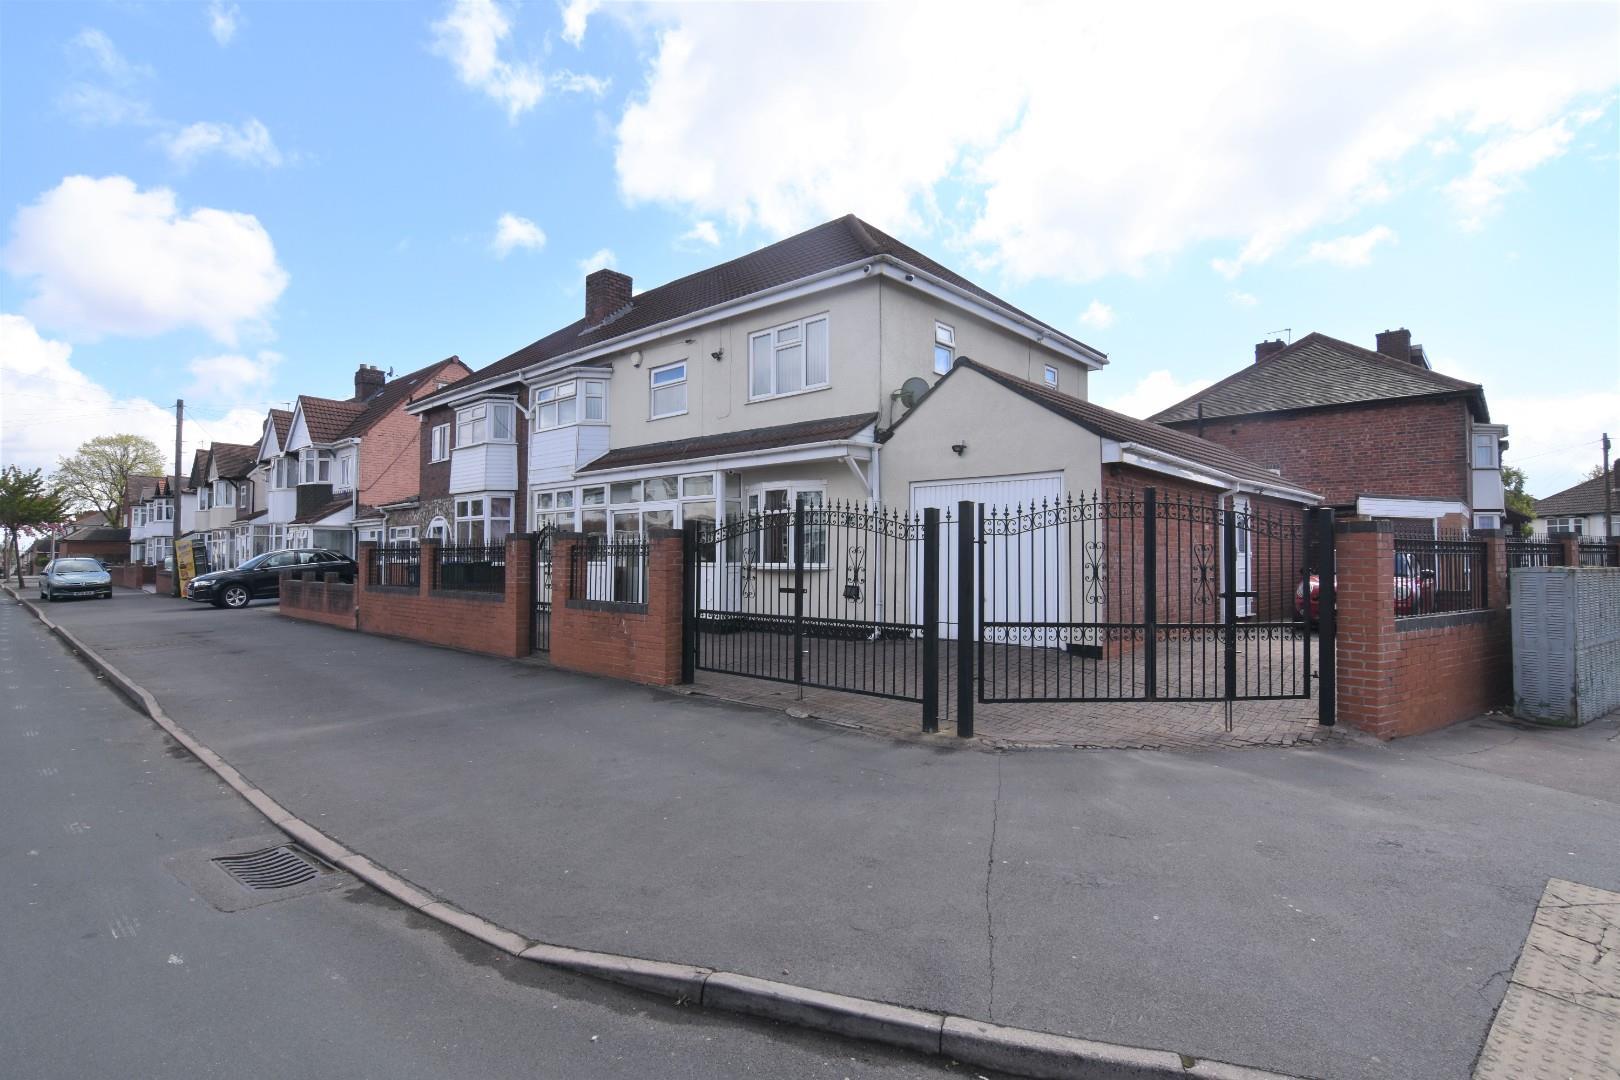 Frank Road, Smethwick